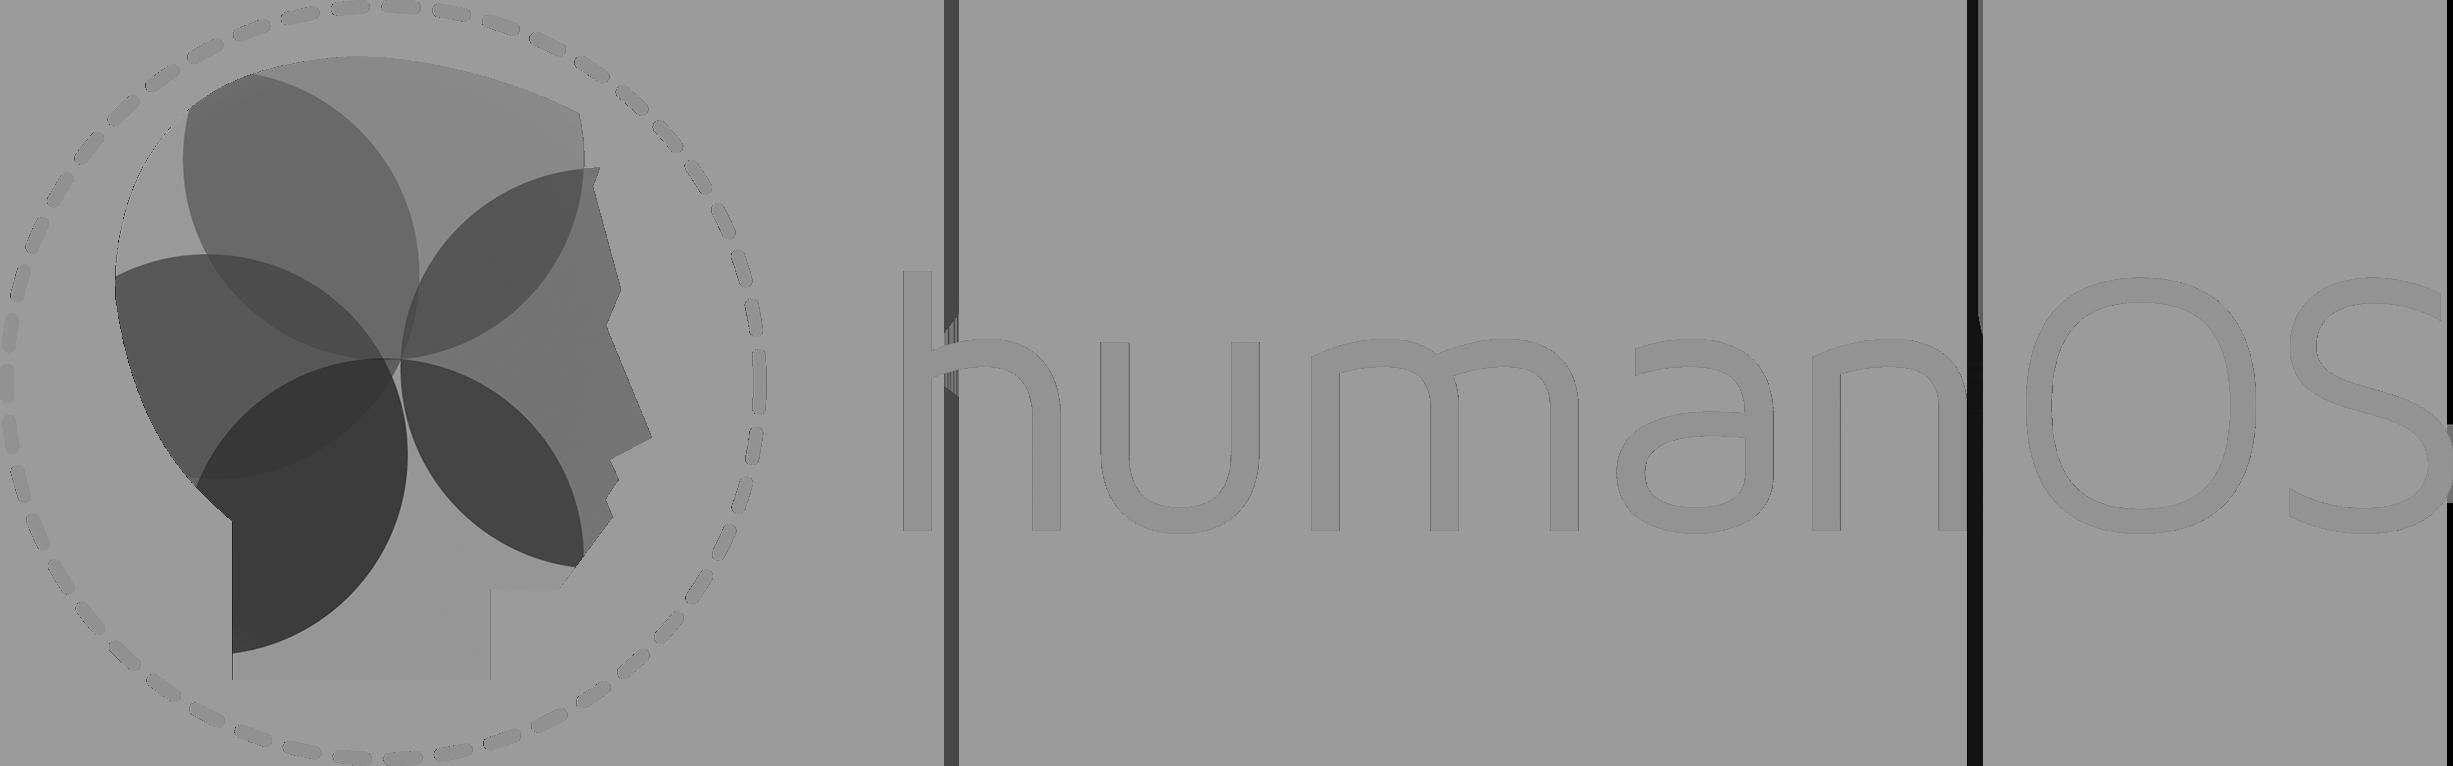 HumanOS_Logo_fixed-xxl-bw copy 2.png